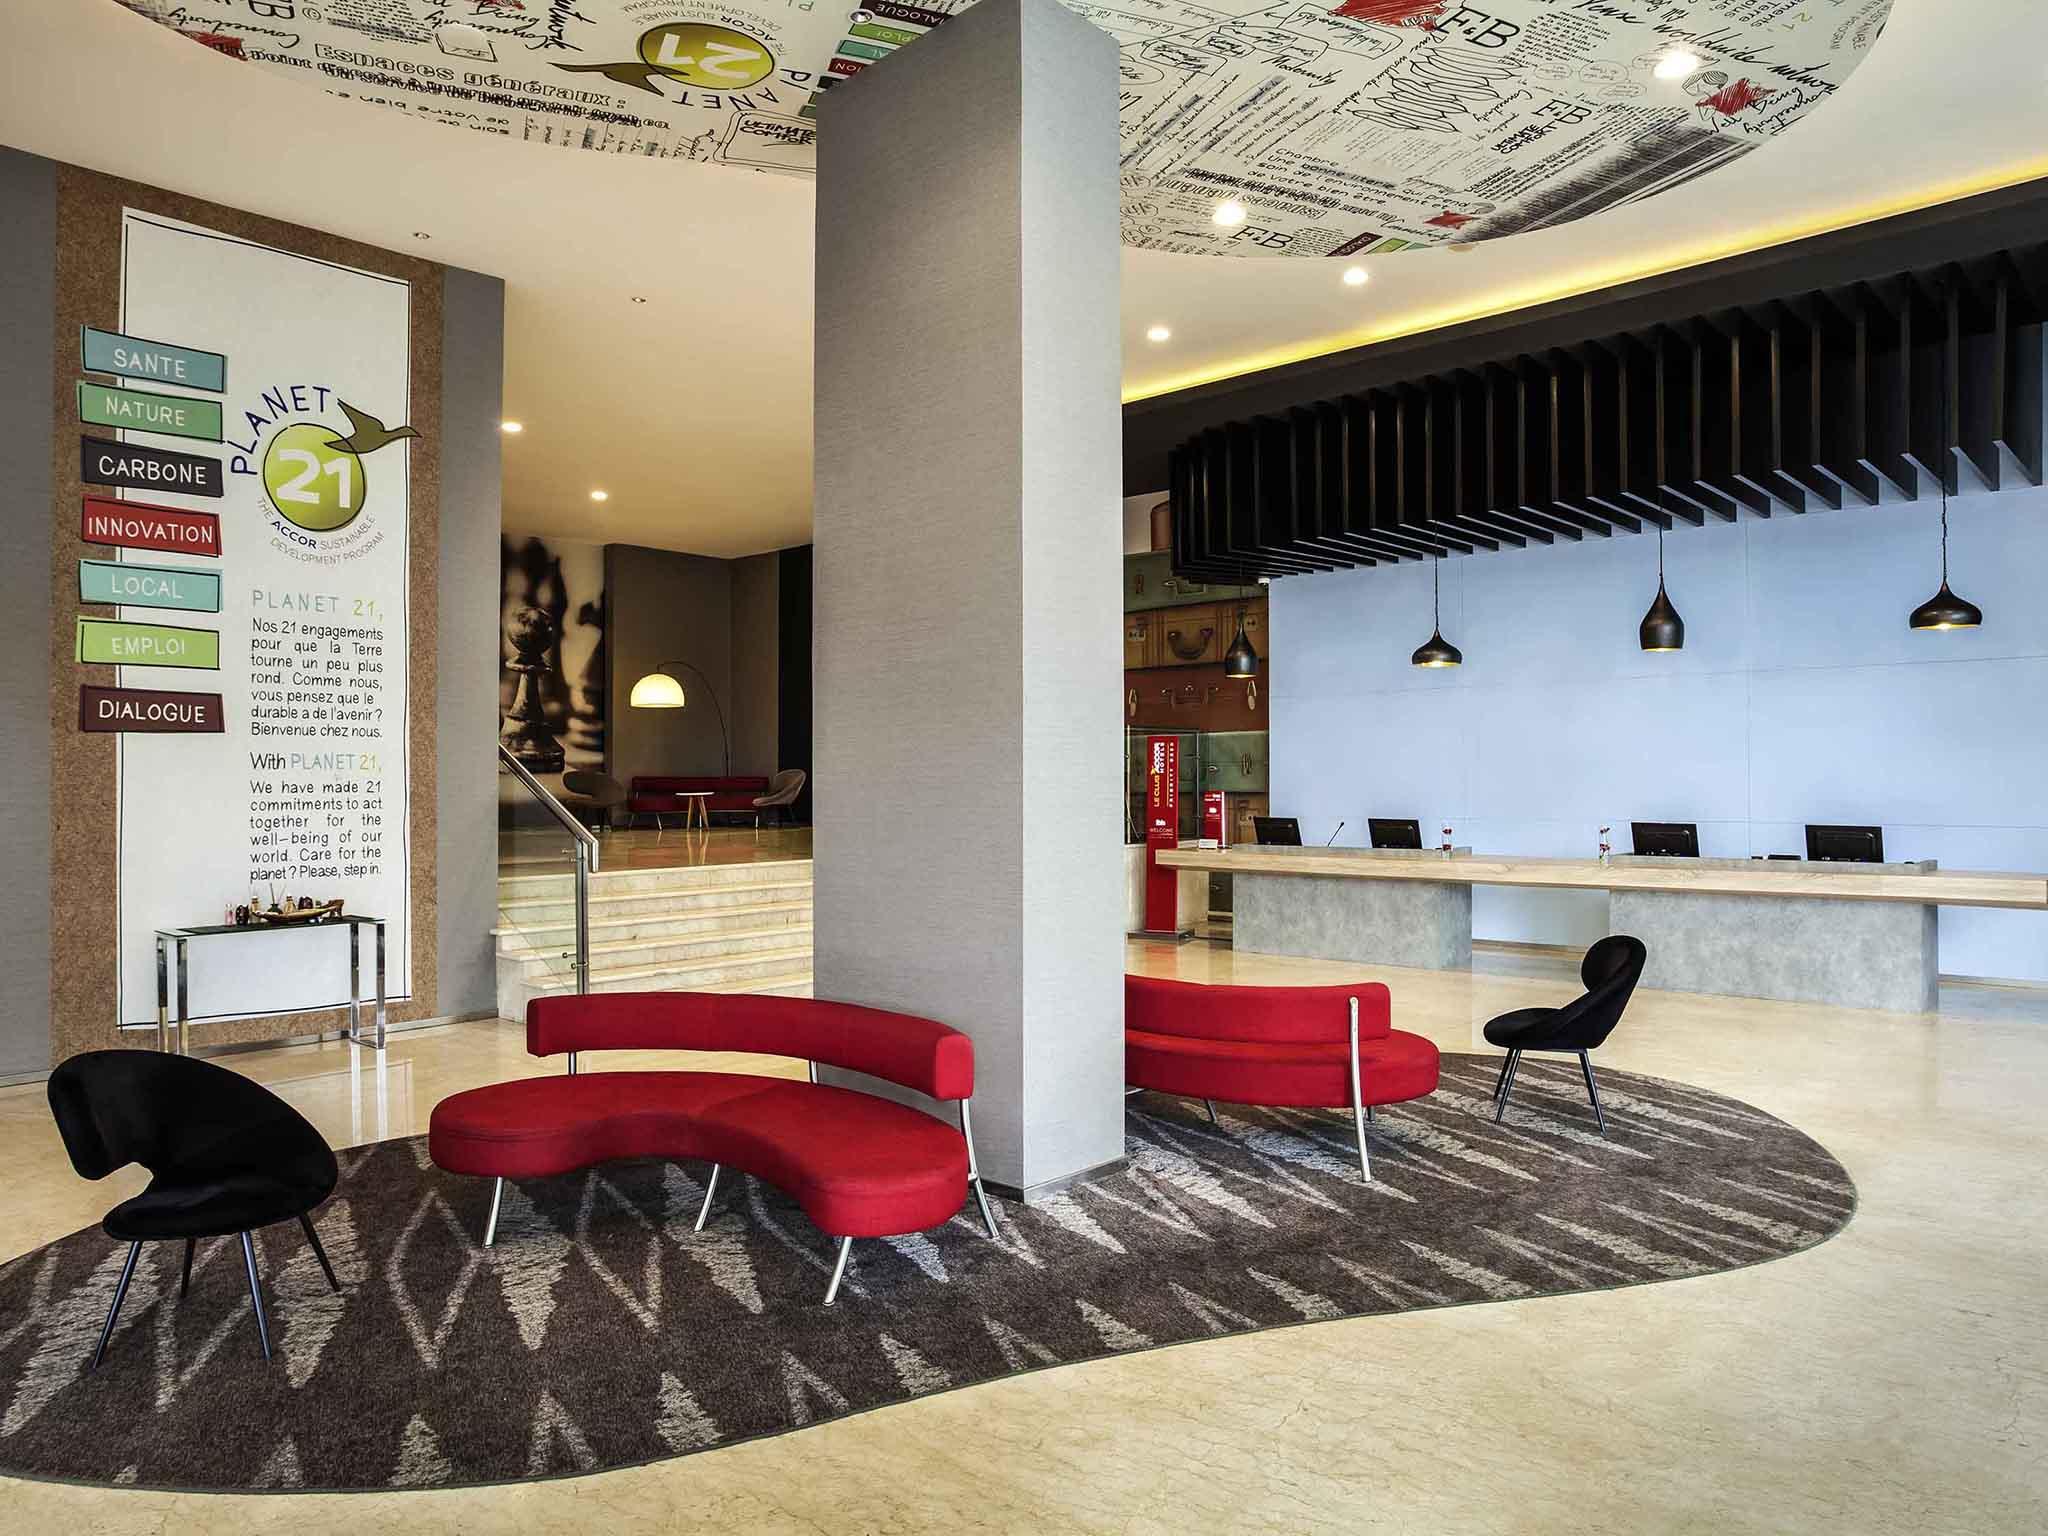 Hotel Jakarta Ibis Harmoni Alive Museum Ancol Kota Administrasi Utara